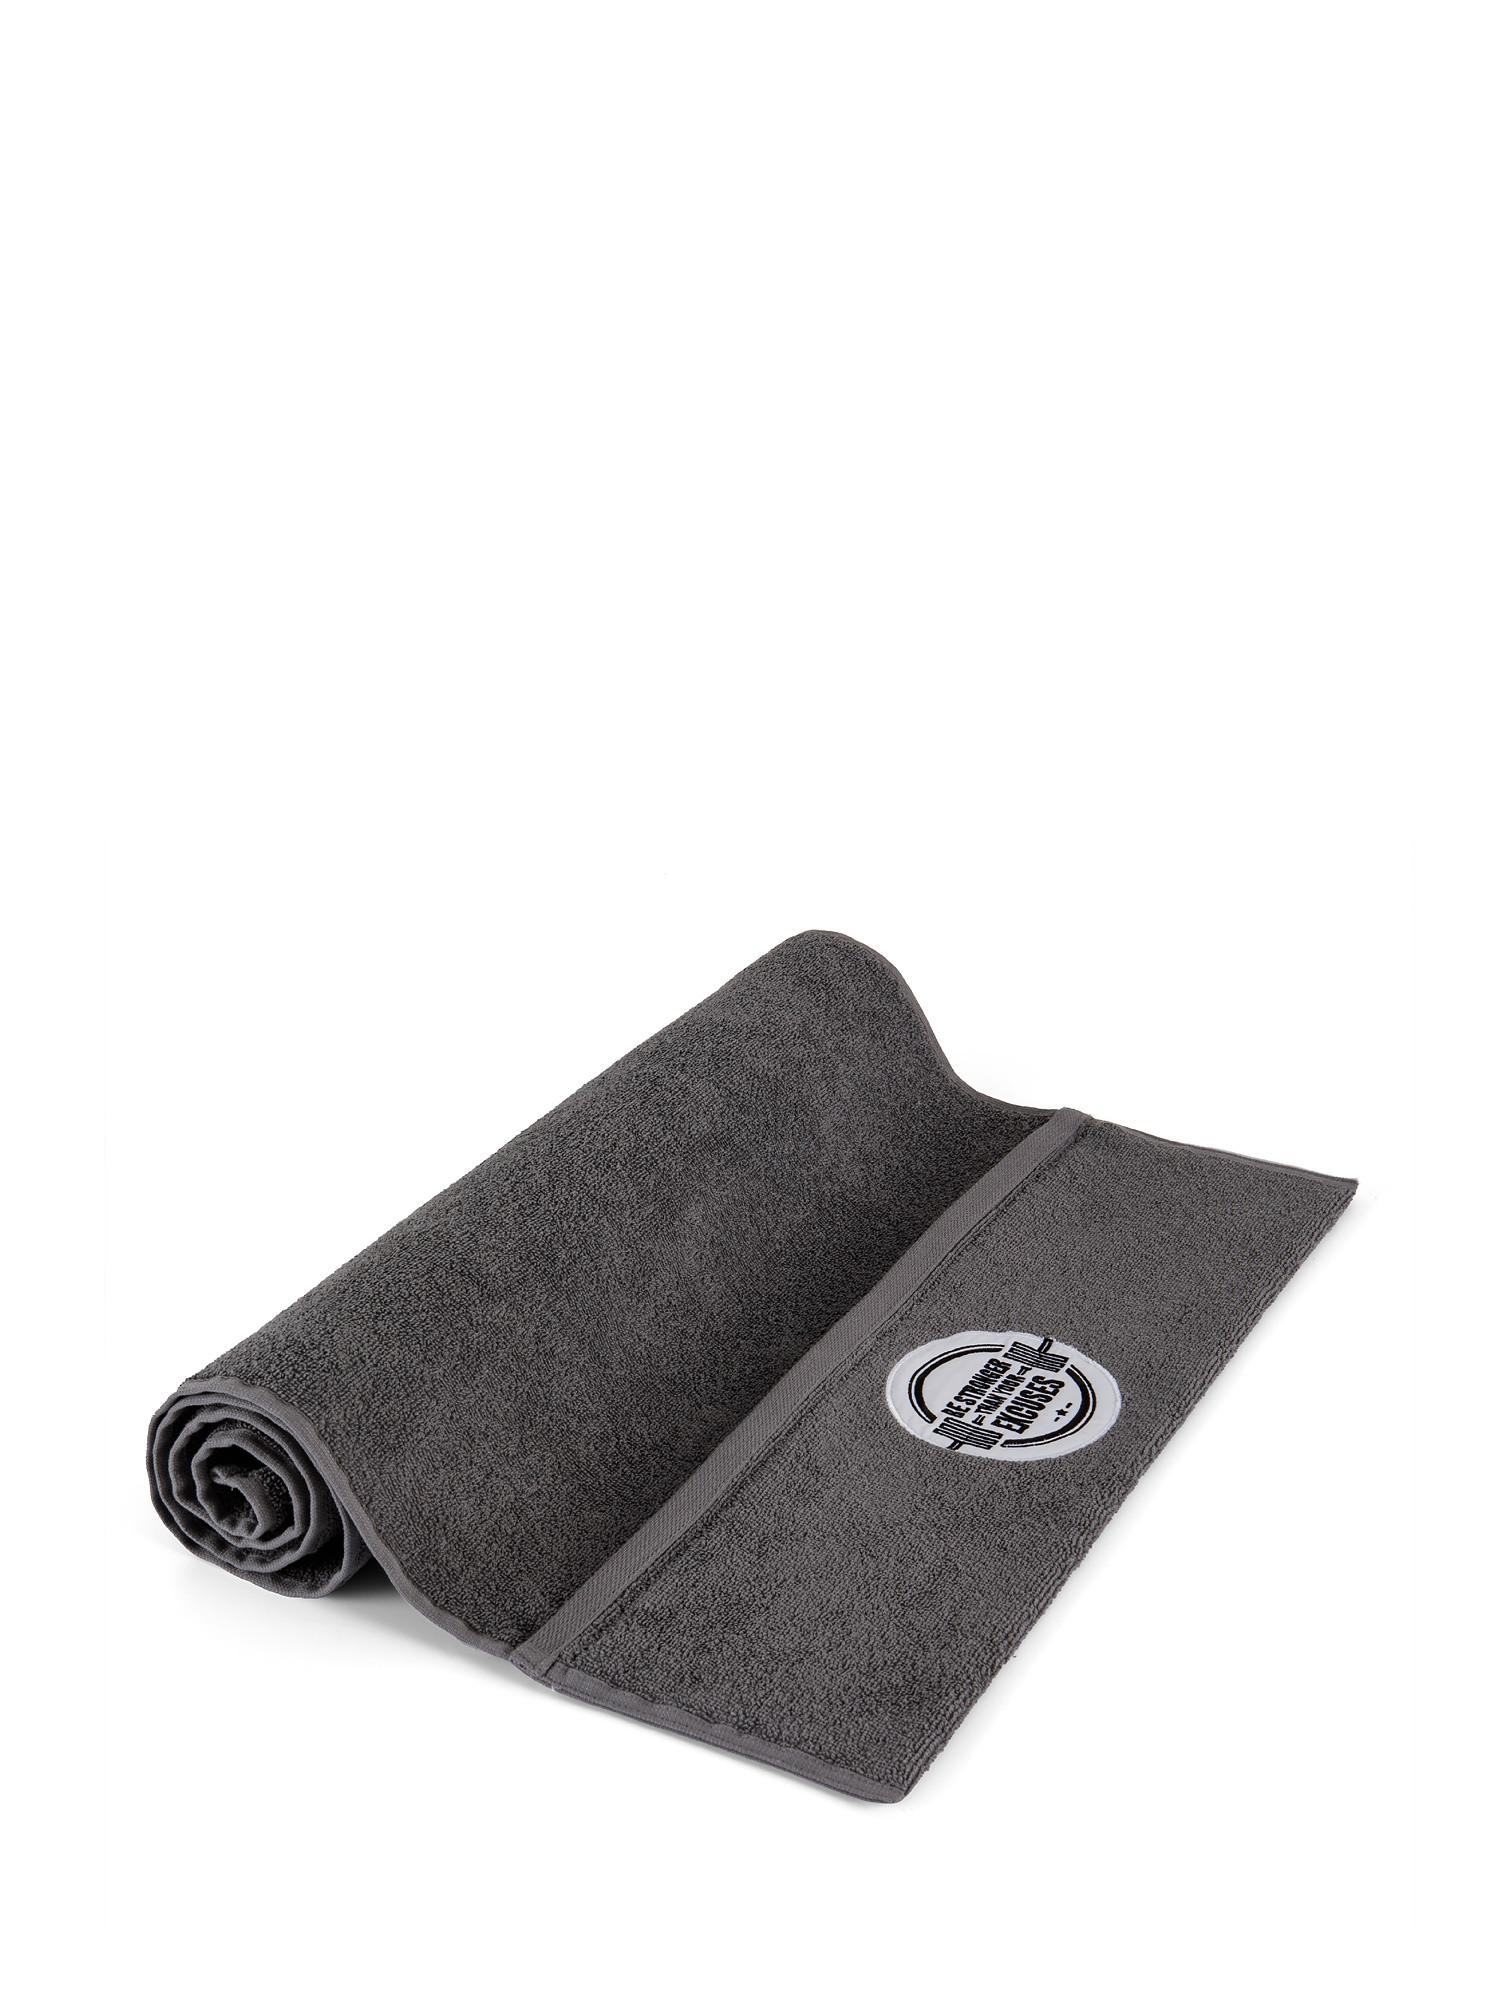 Asciugamano da palestra e fitness, Grigio, large image number 0